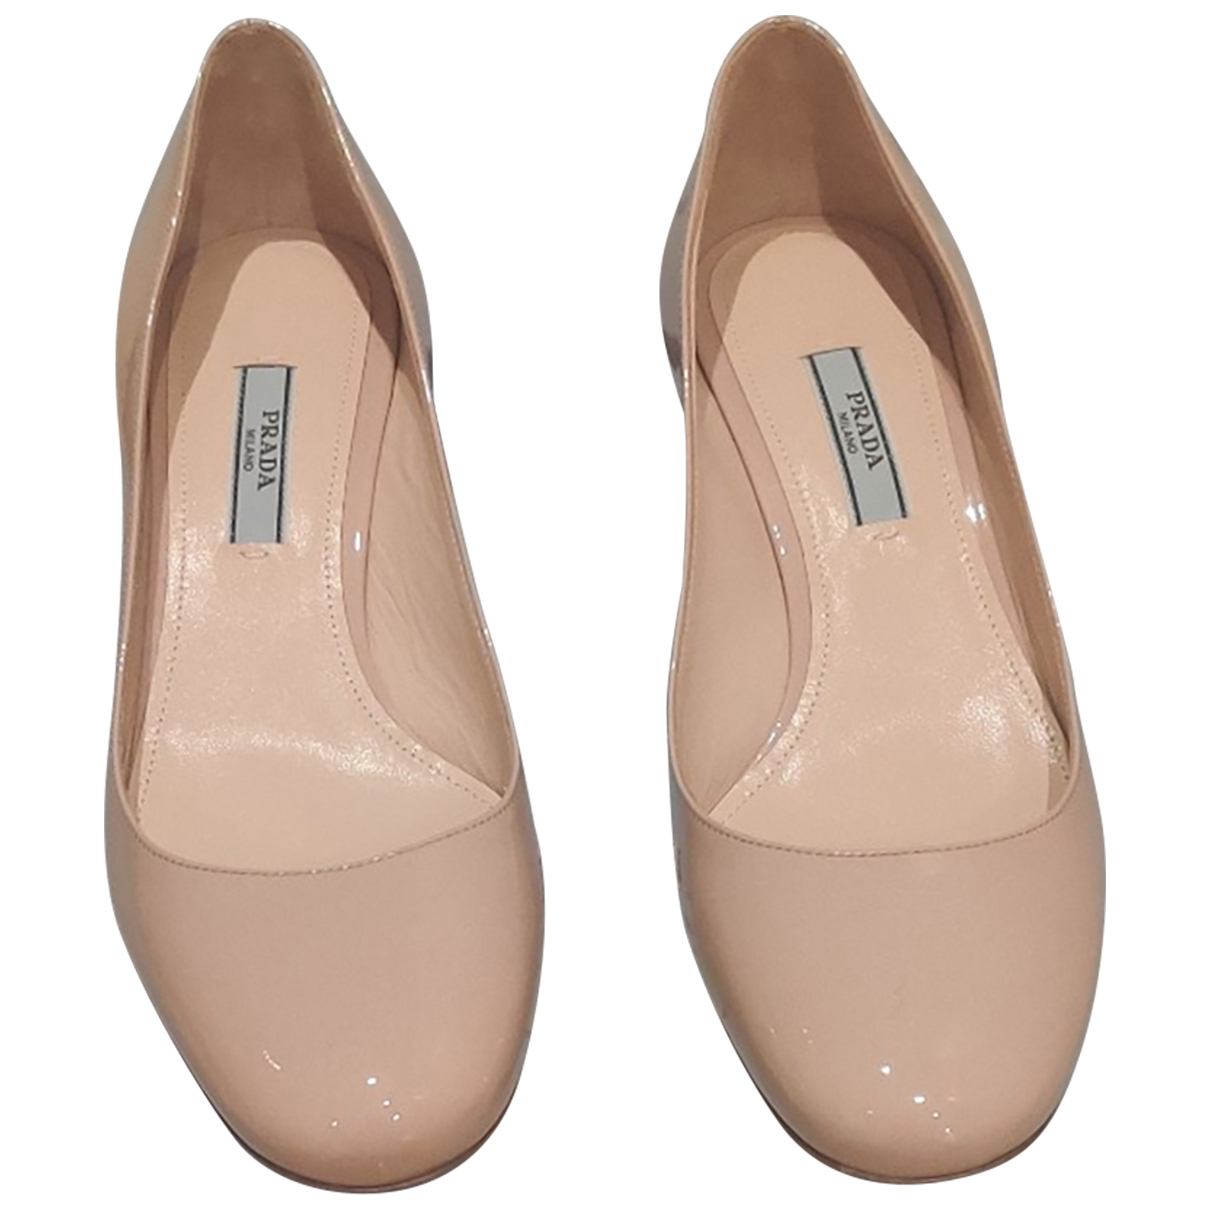 Prada \N Beige Patent leather Heels for Women 37 EU